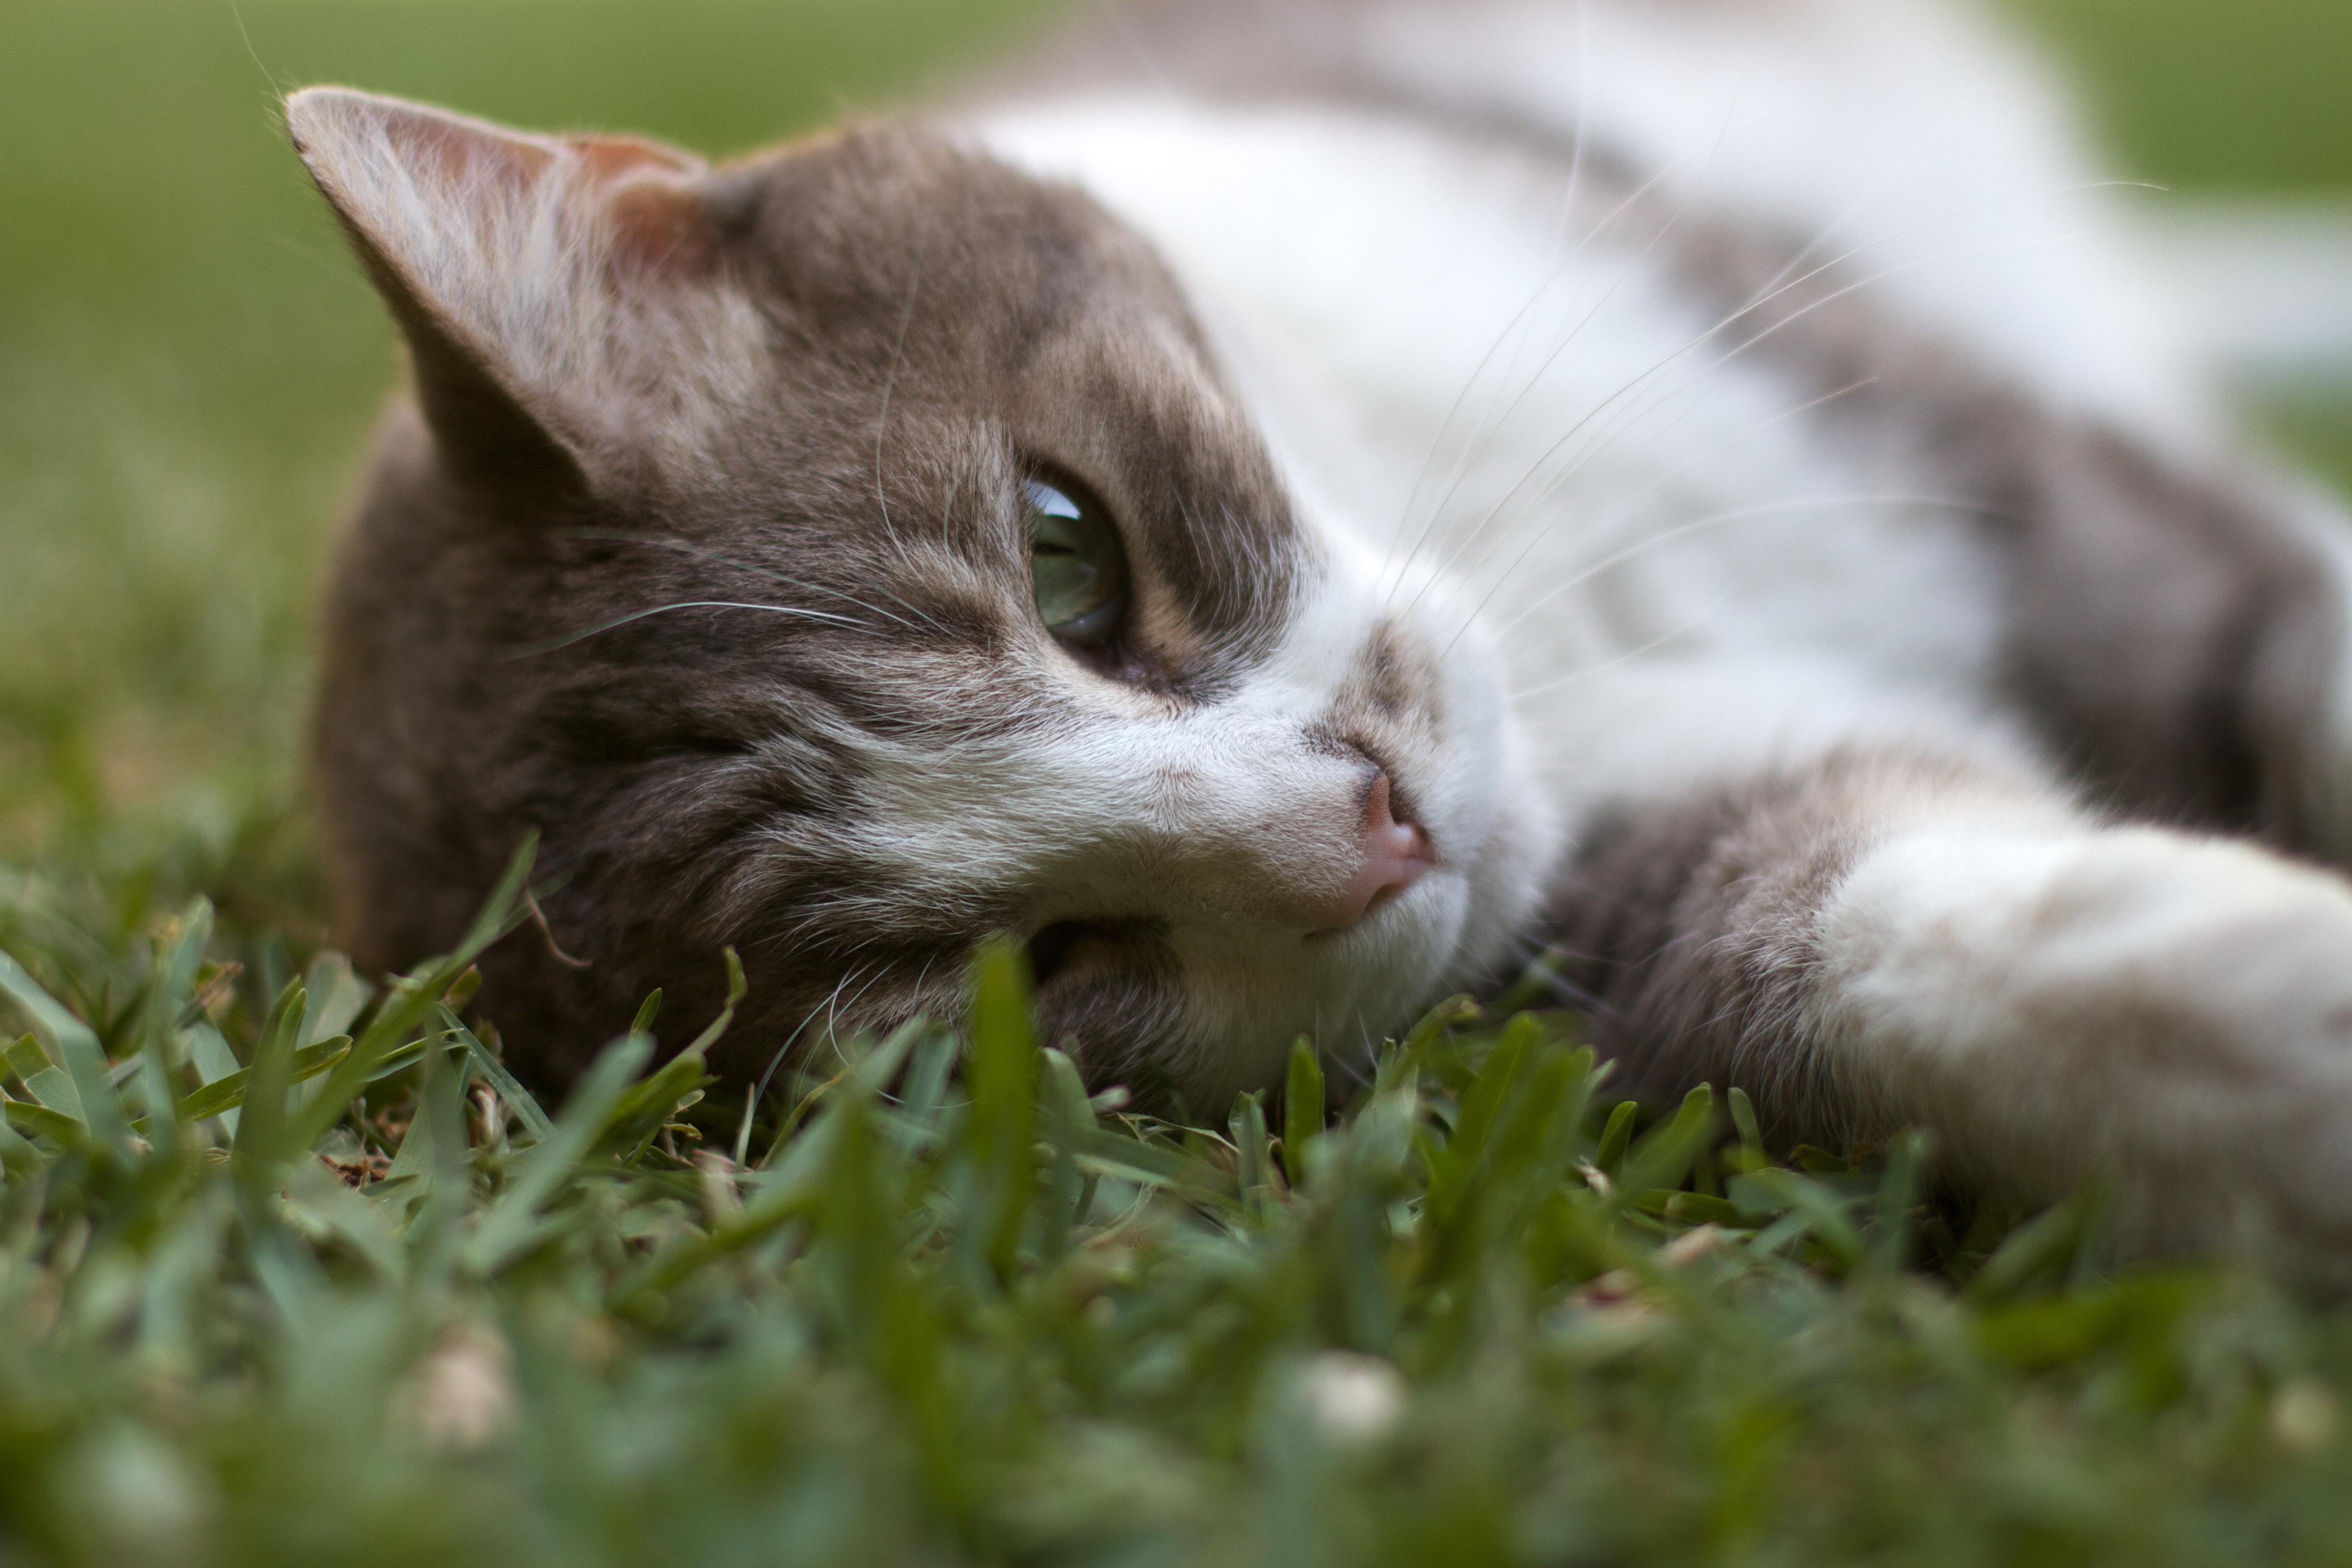 Buba in the Grass, Animal, Cat, Grass, Macro, HQ Photo